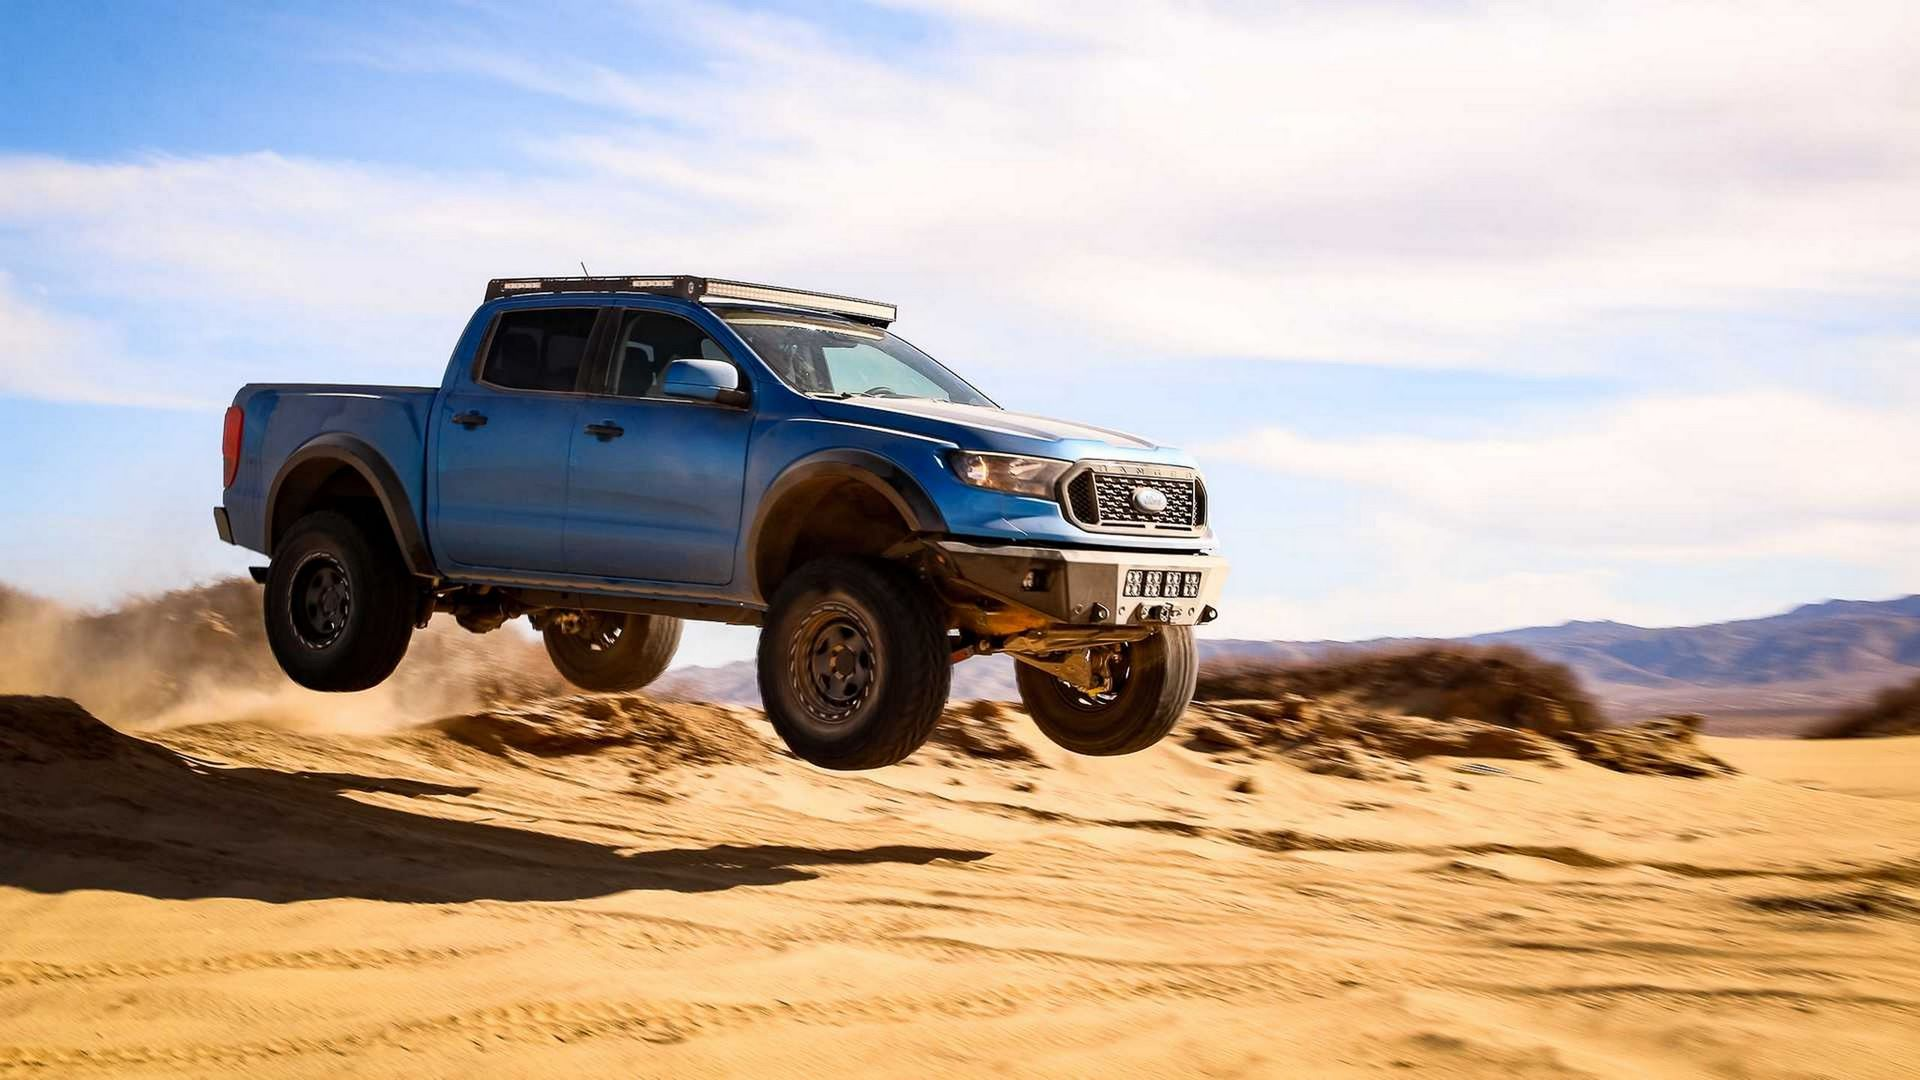 Ford-Ranger-Prorunner-By-APG-11